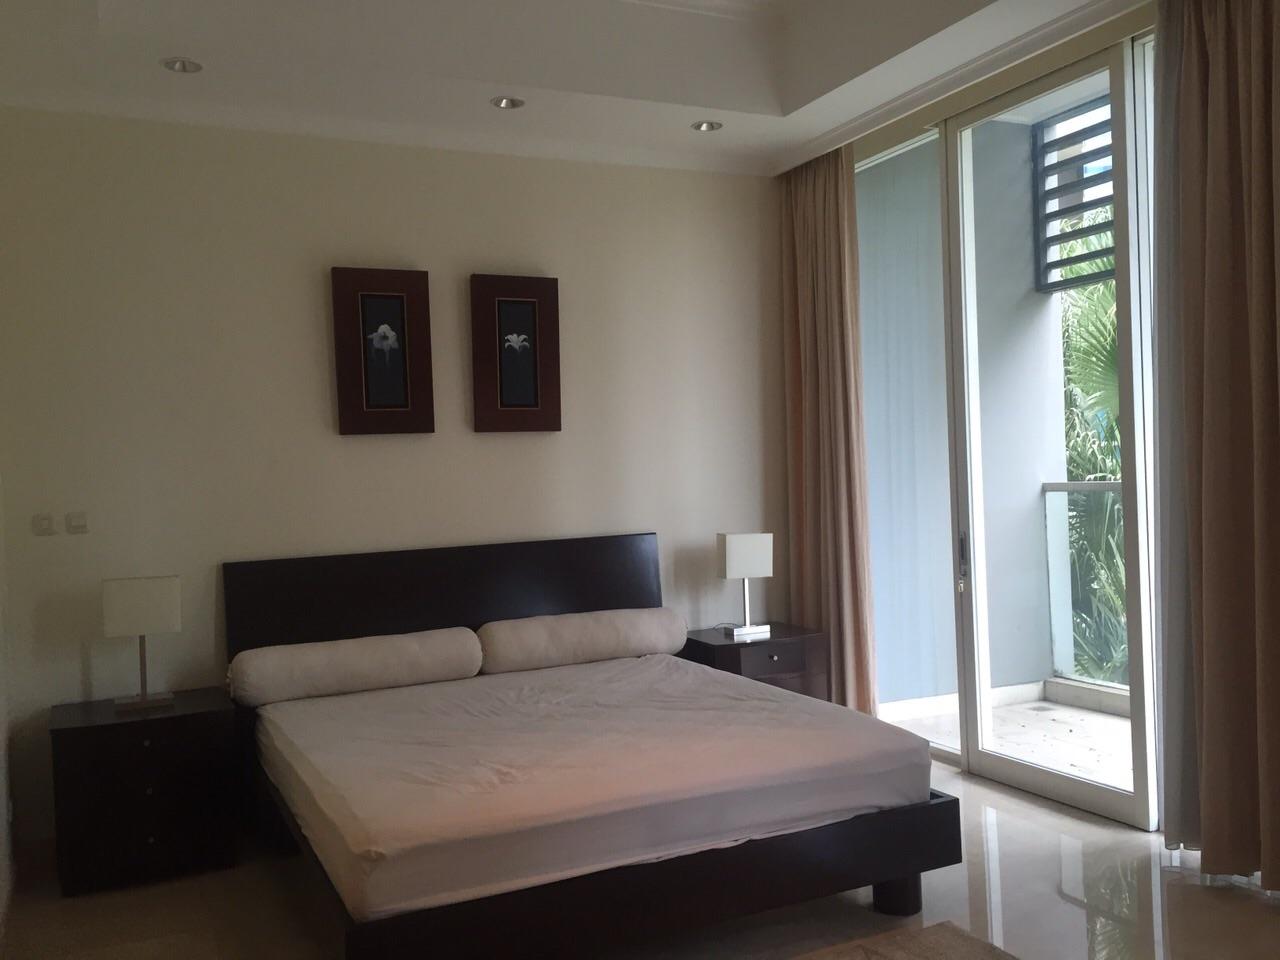 bedrooms furnished for rent sudirman residence jakarta